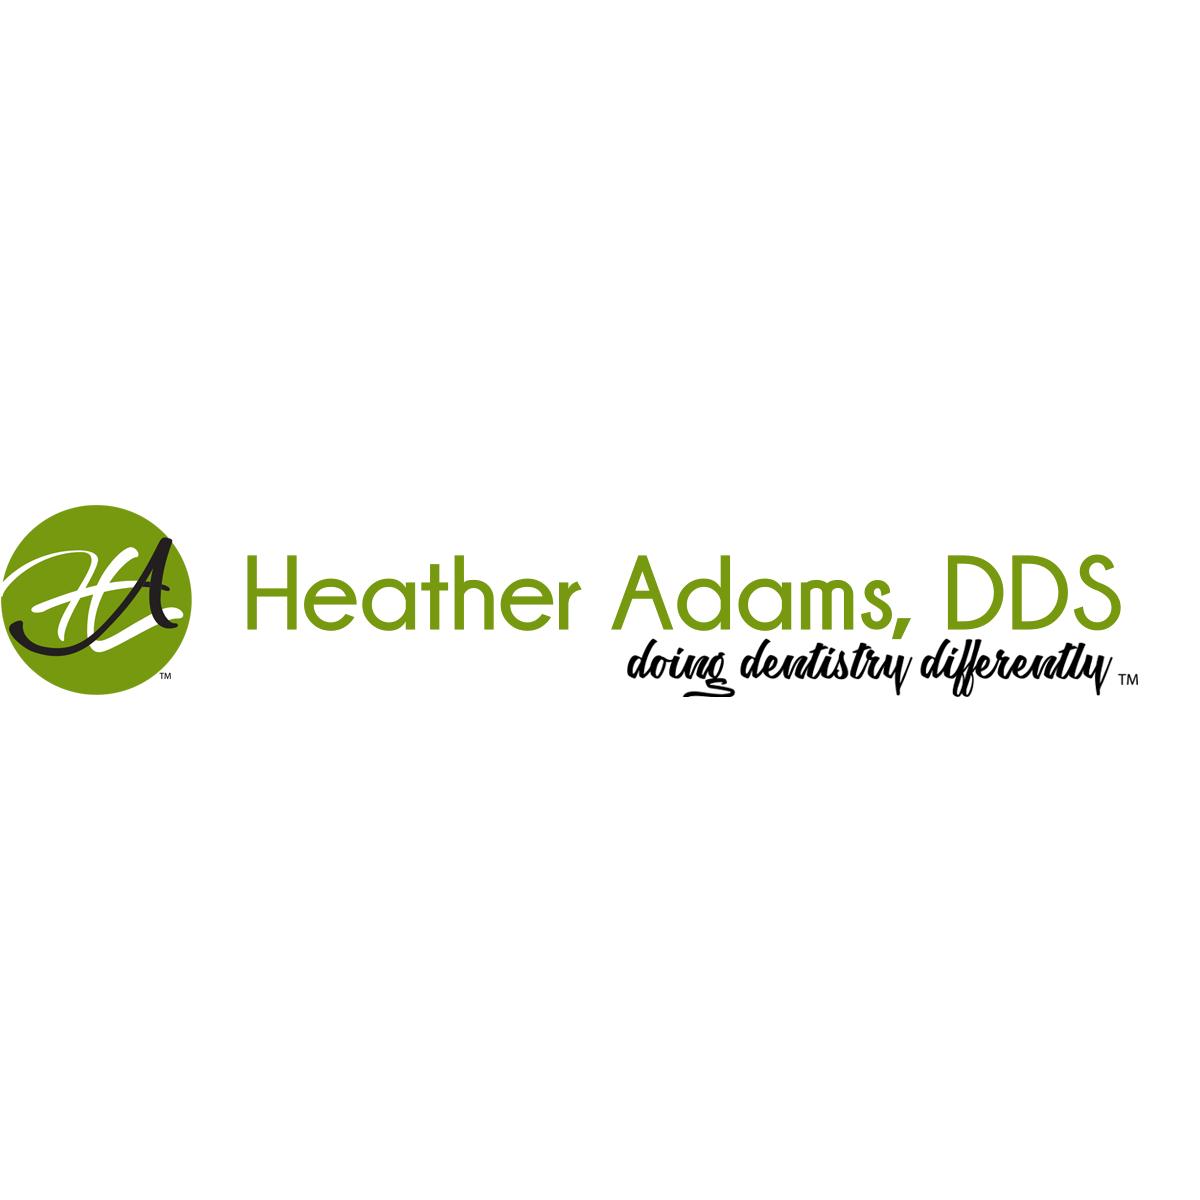 Heather Adams Dentistry